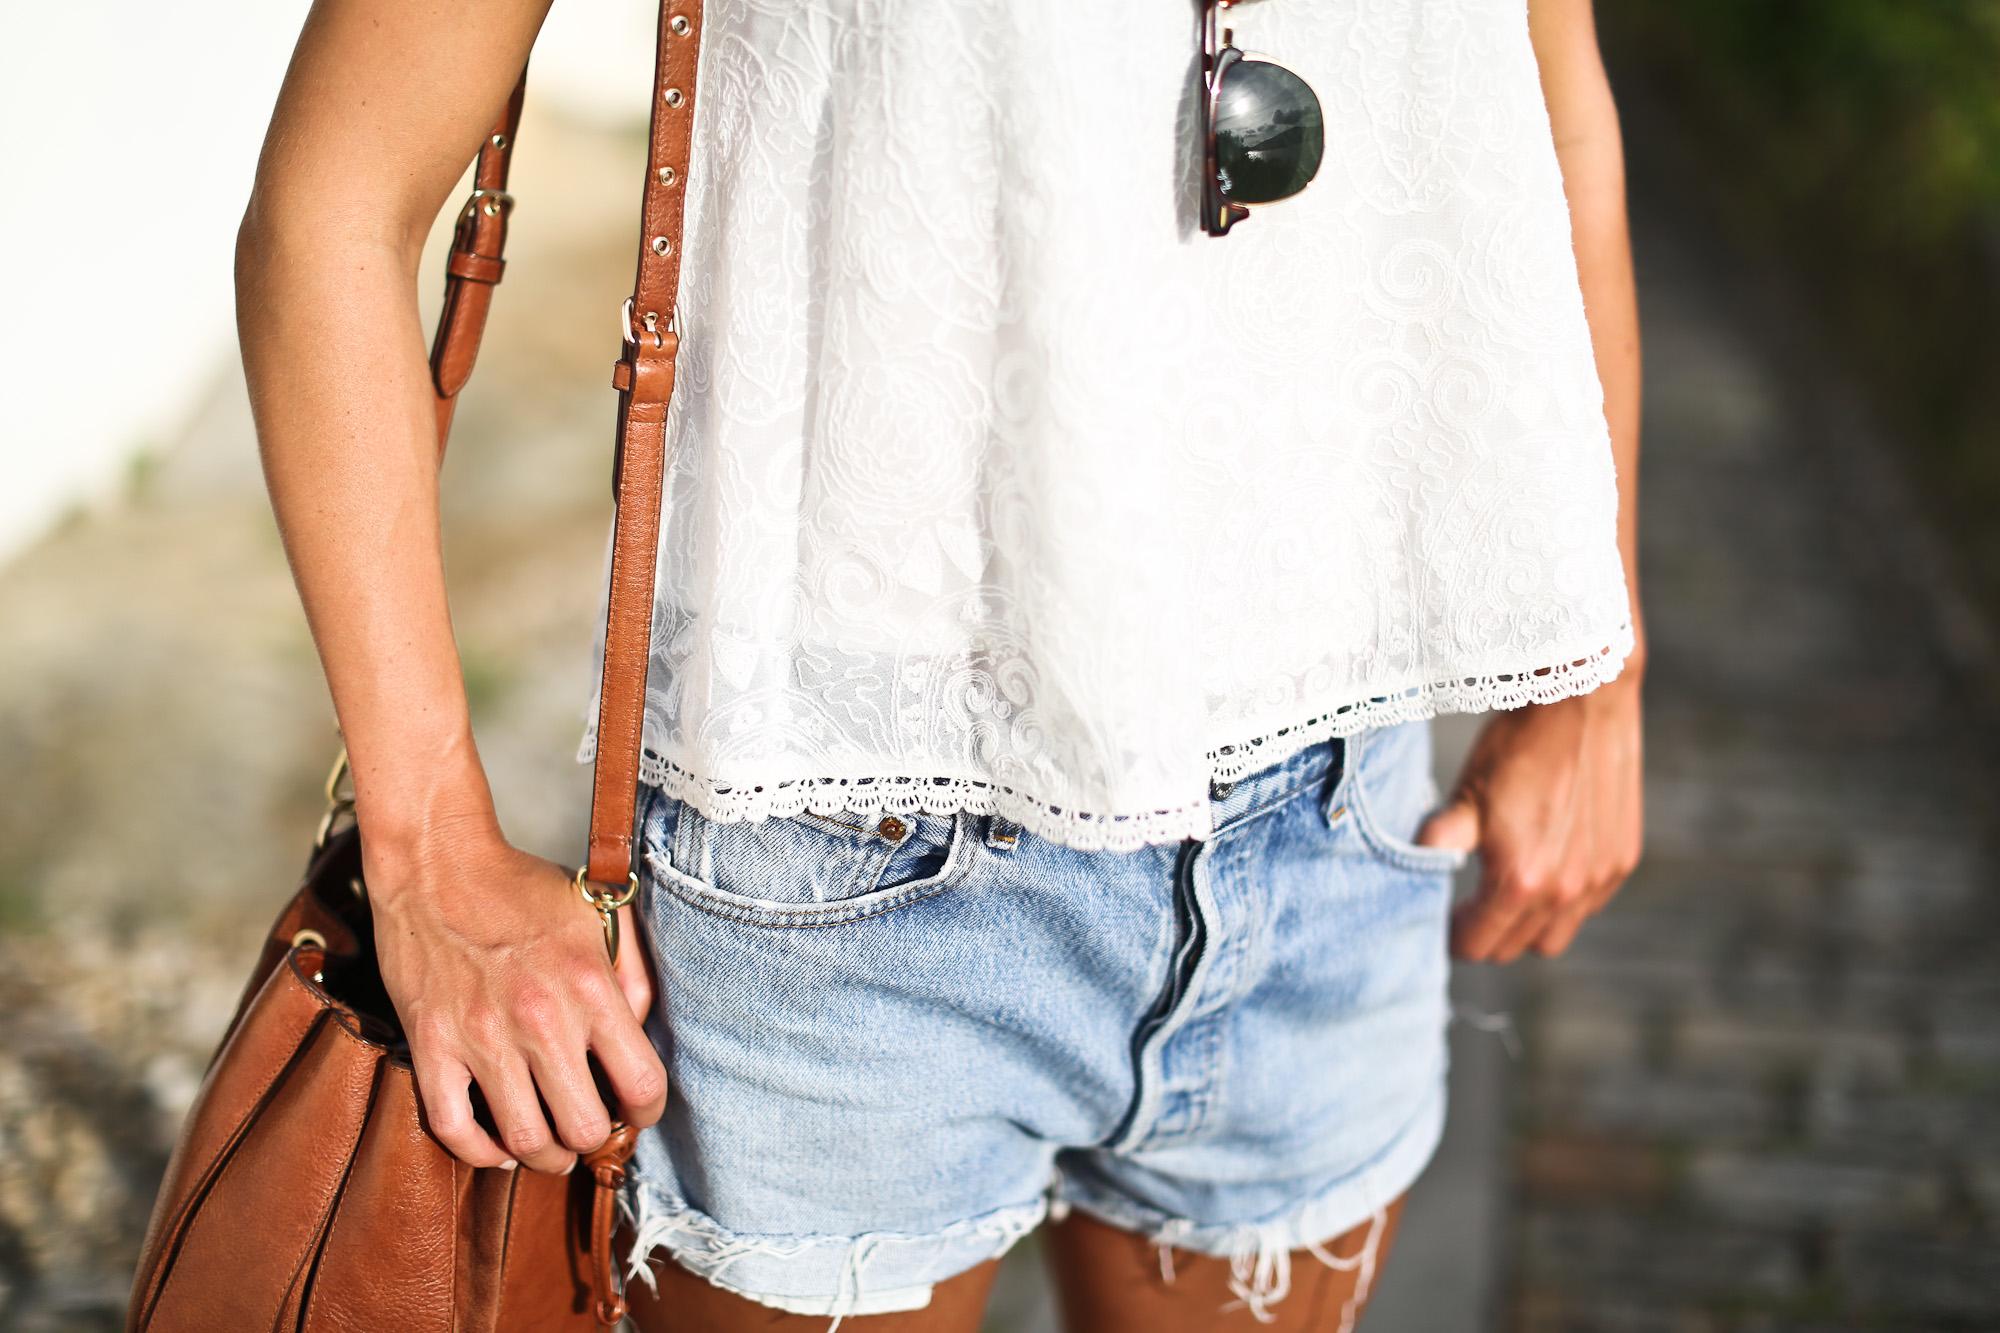 Clochet_streetstyle_levis_501_vintage_shorts_leather_fedora_hat-5